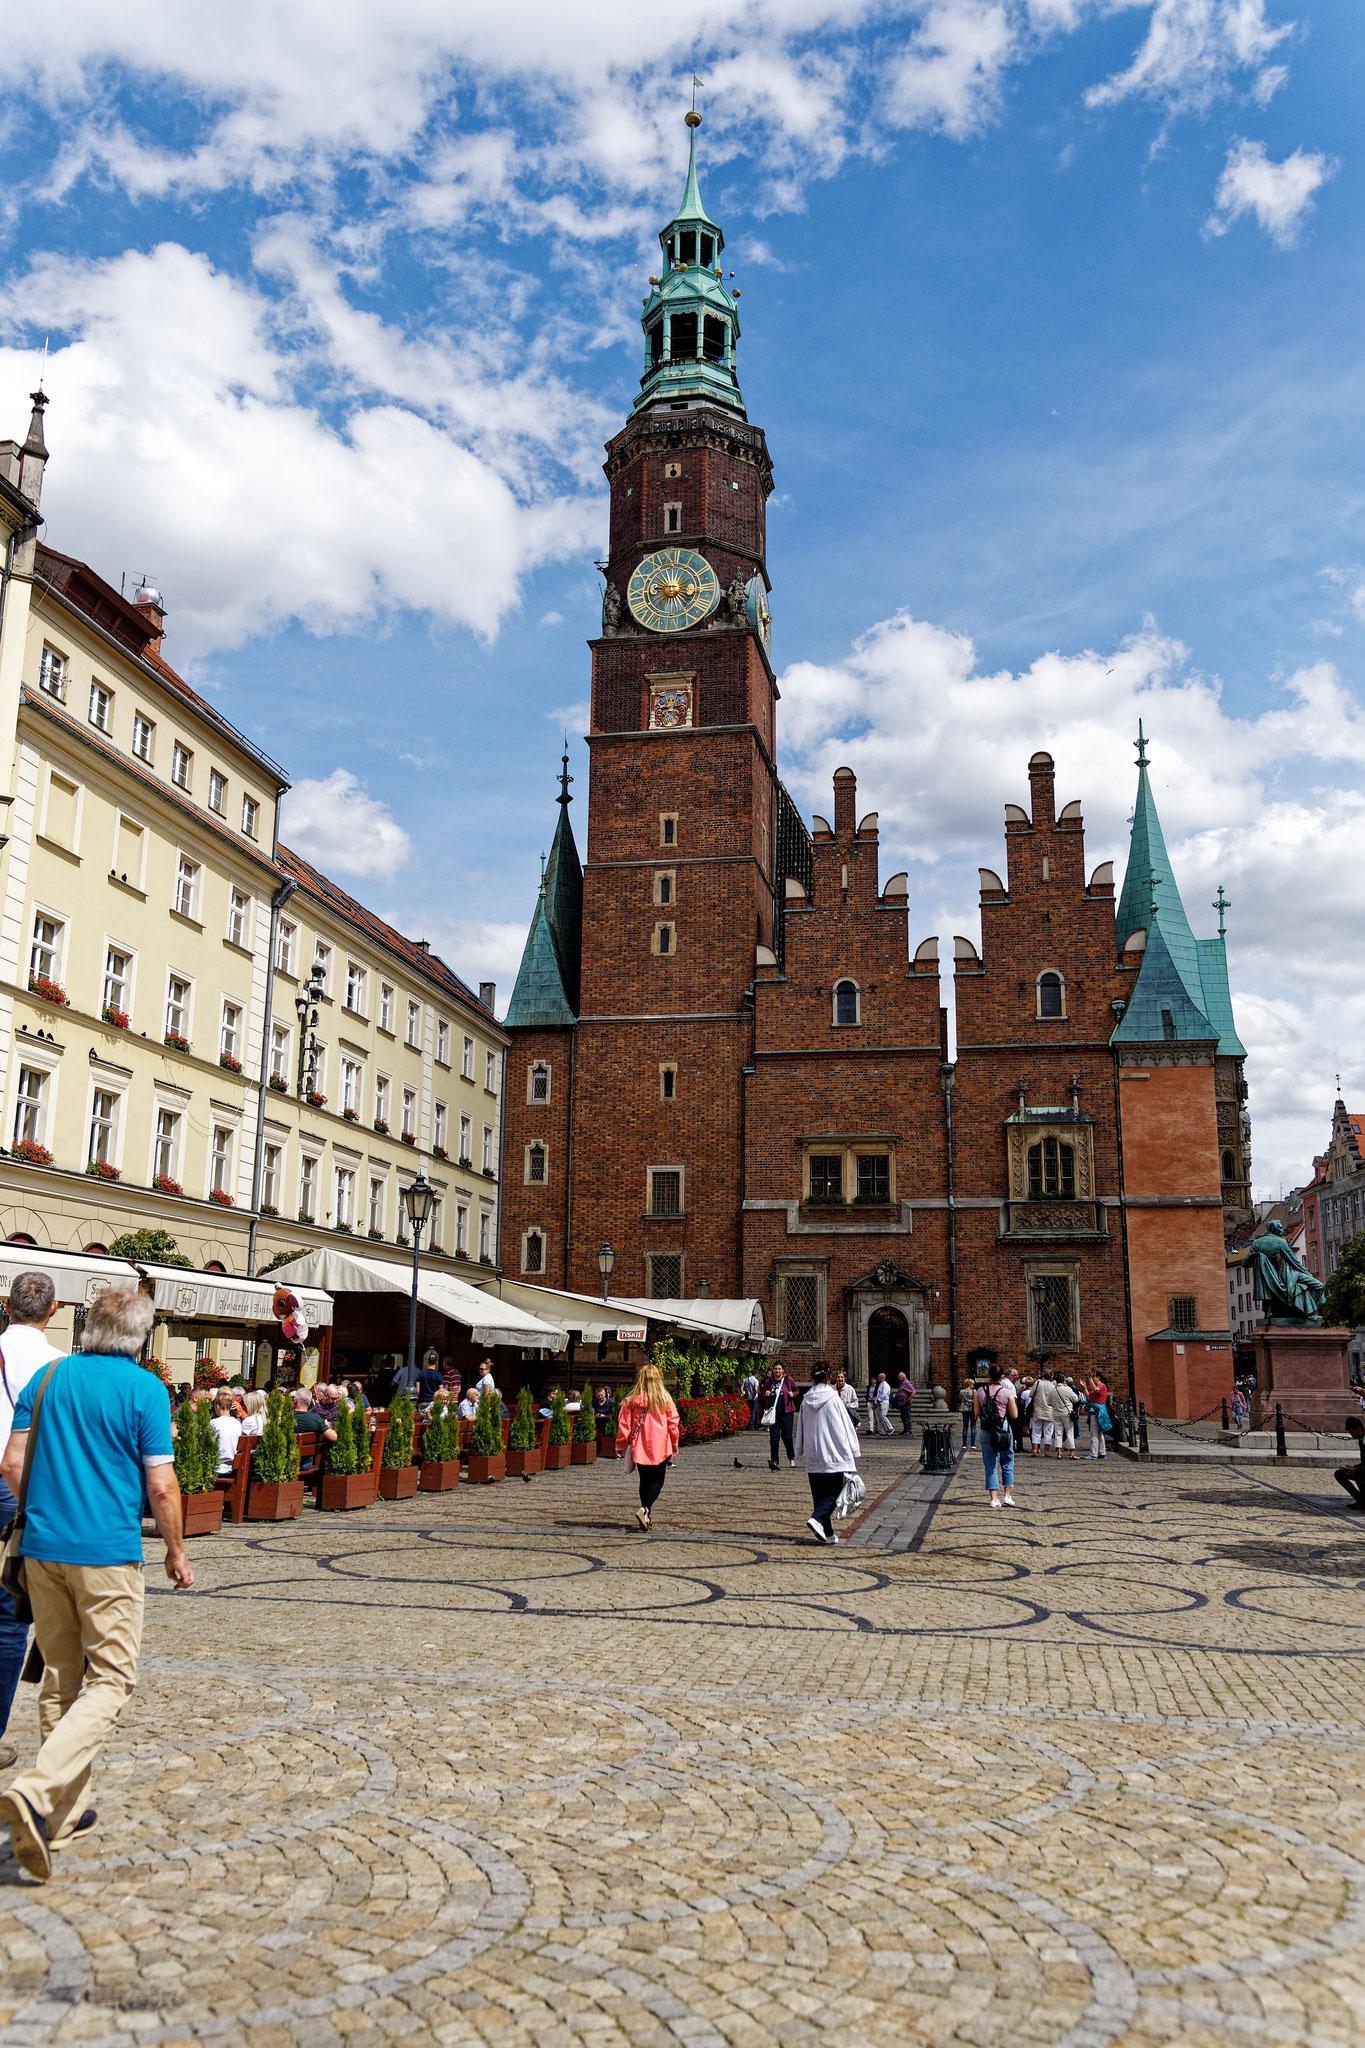 Breslau Marktplatz